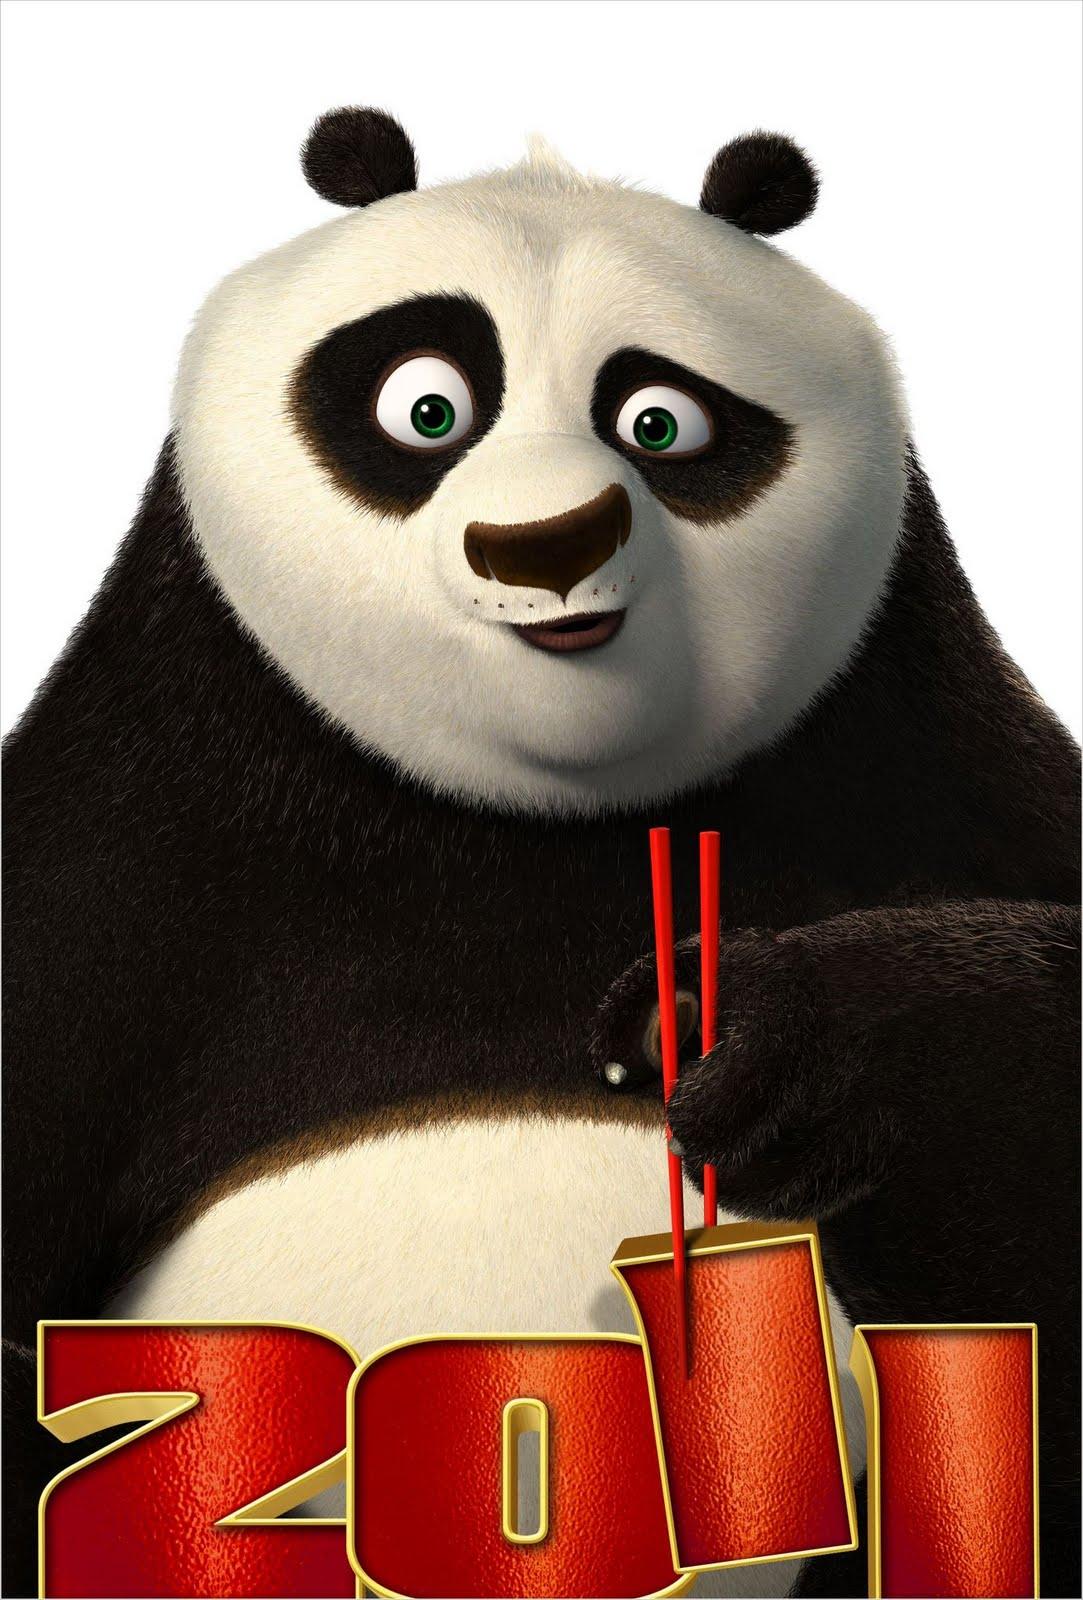 Www Animation Wallpaper Com Kung Fu Panda 2 3d Hd Poster Wallpapers Cartoon Wallpapers